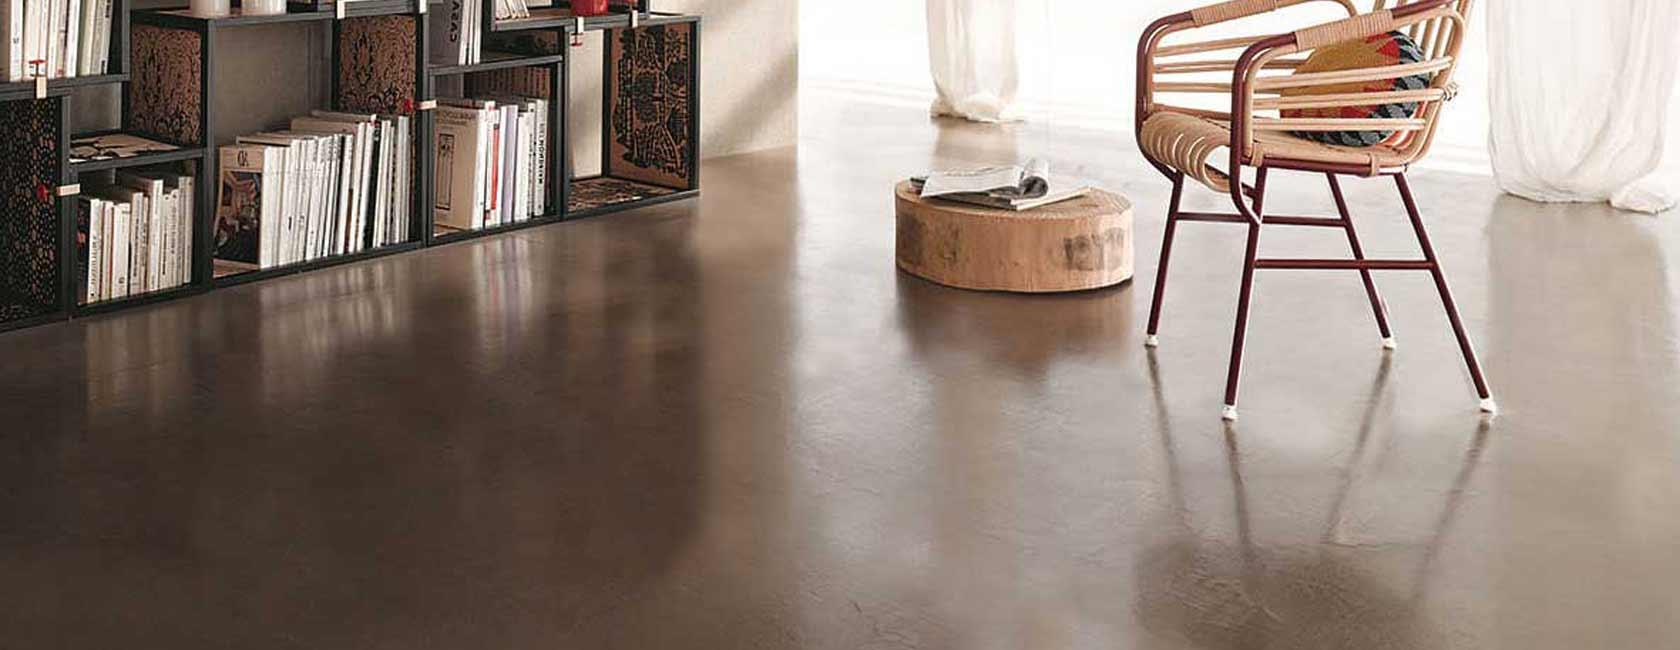 pavimenti in resina o microcemento